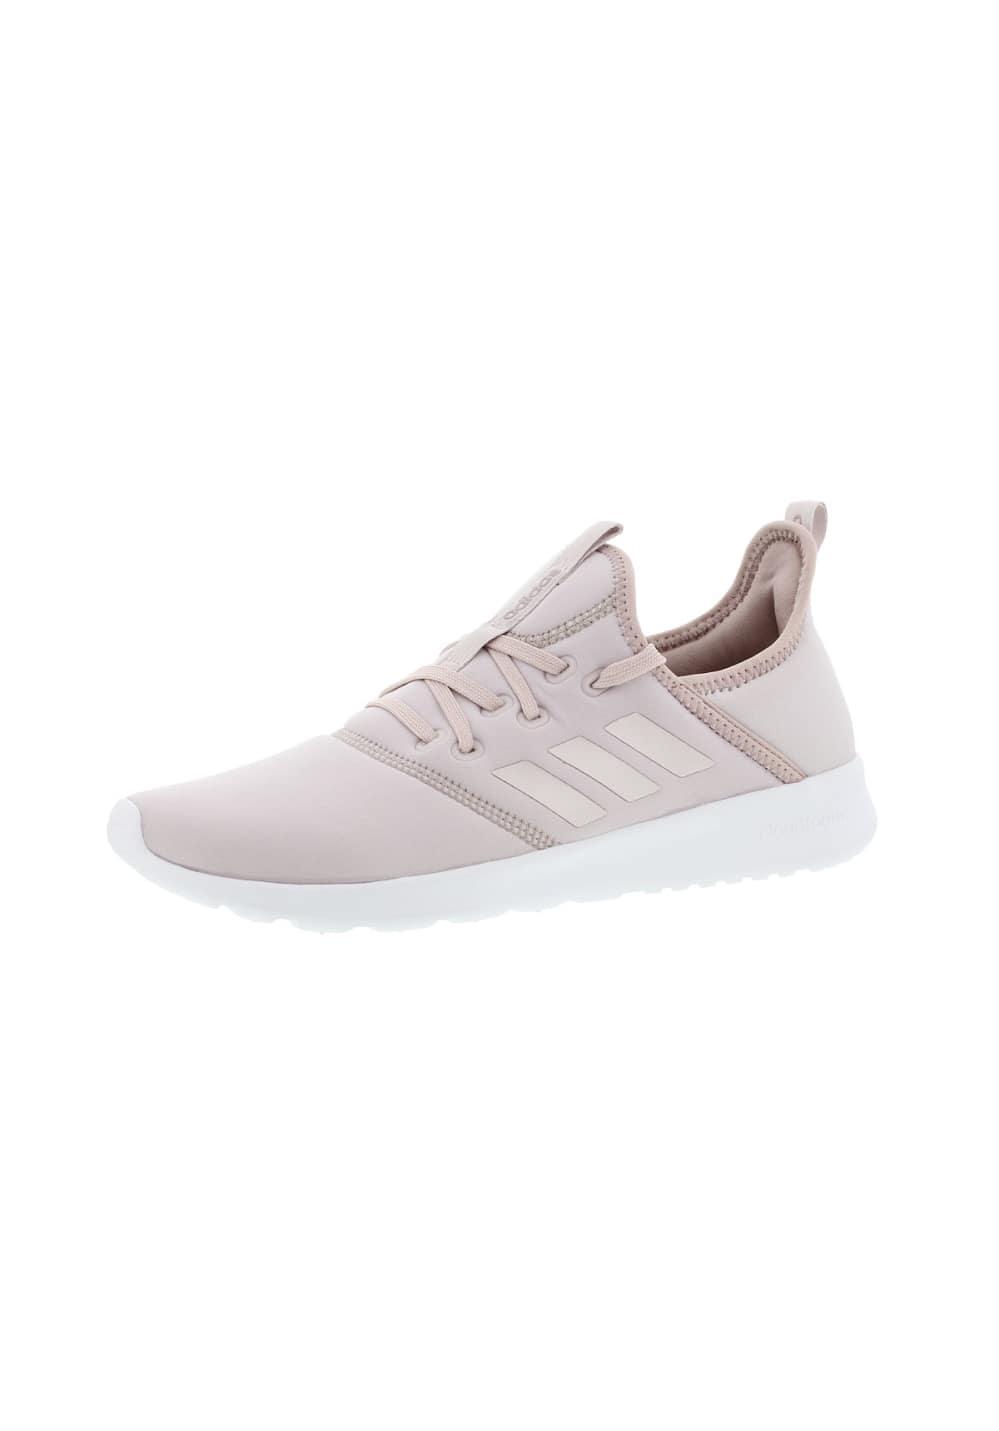 adidas neo Cloudfoam Pure - Laufschuhe für Damen - Pink